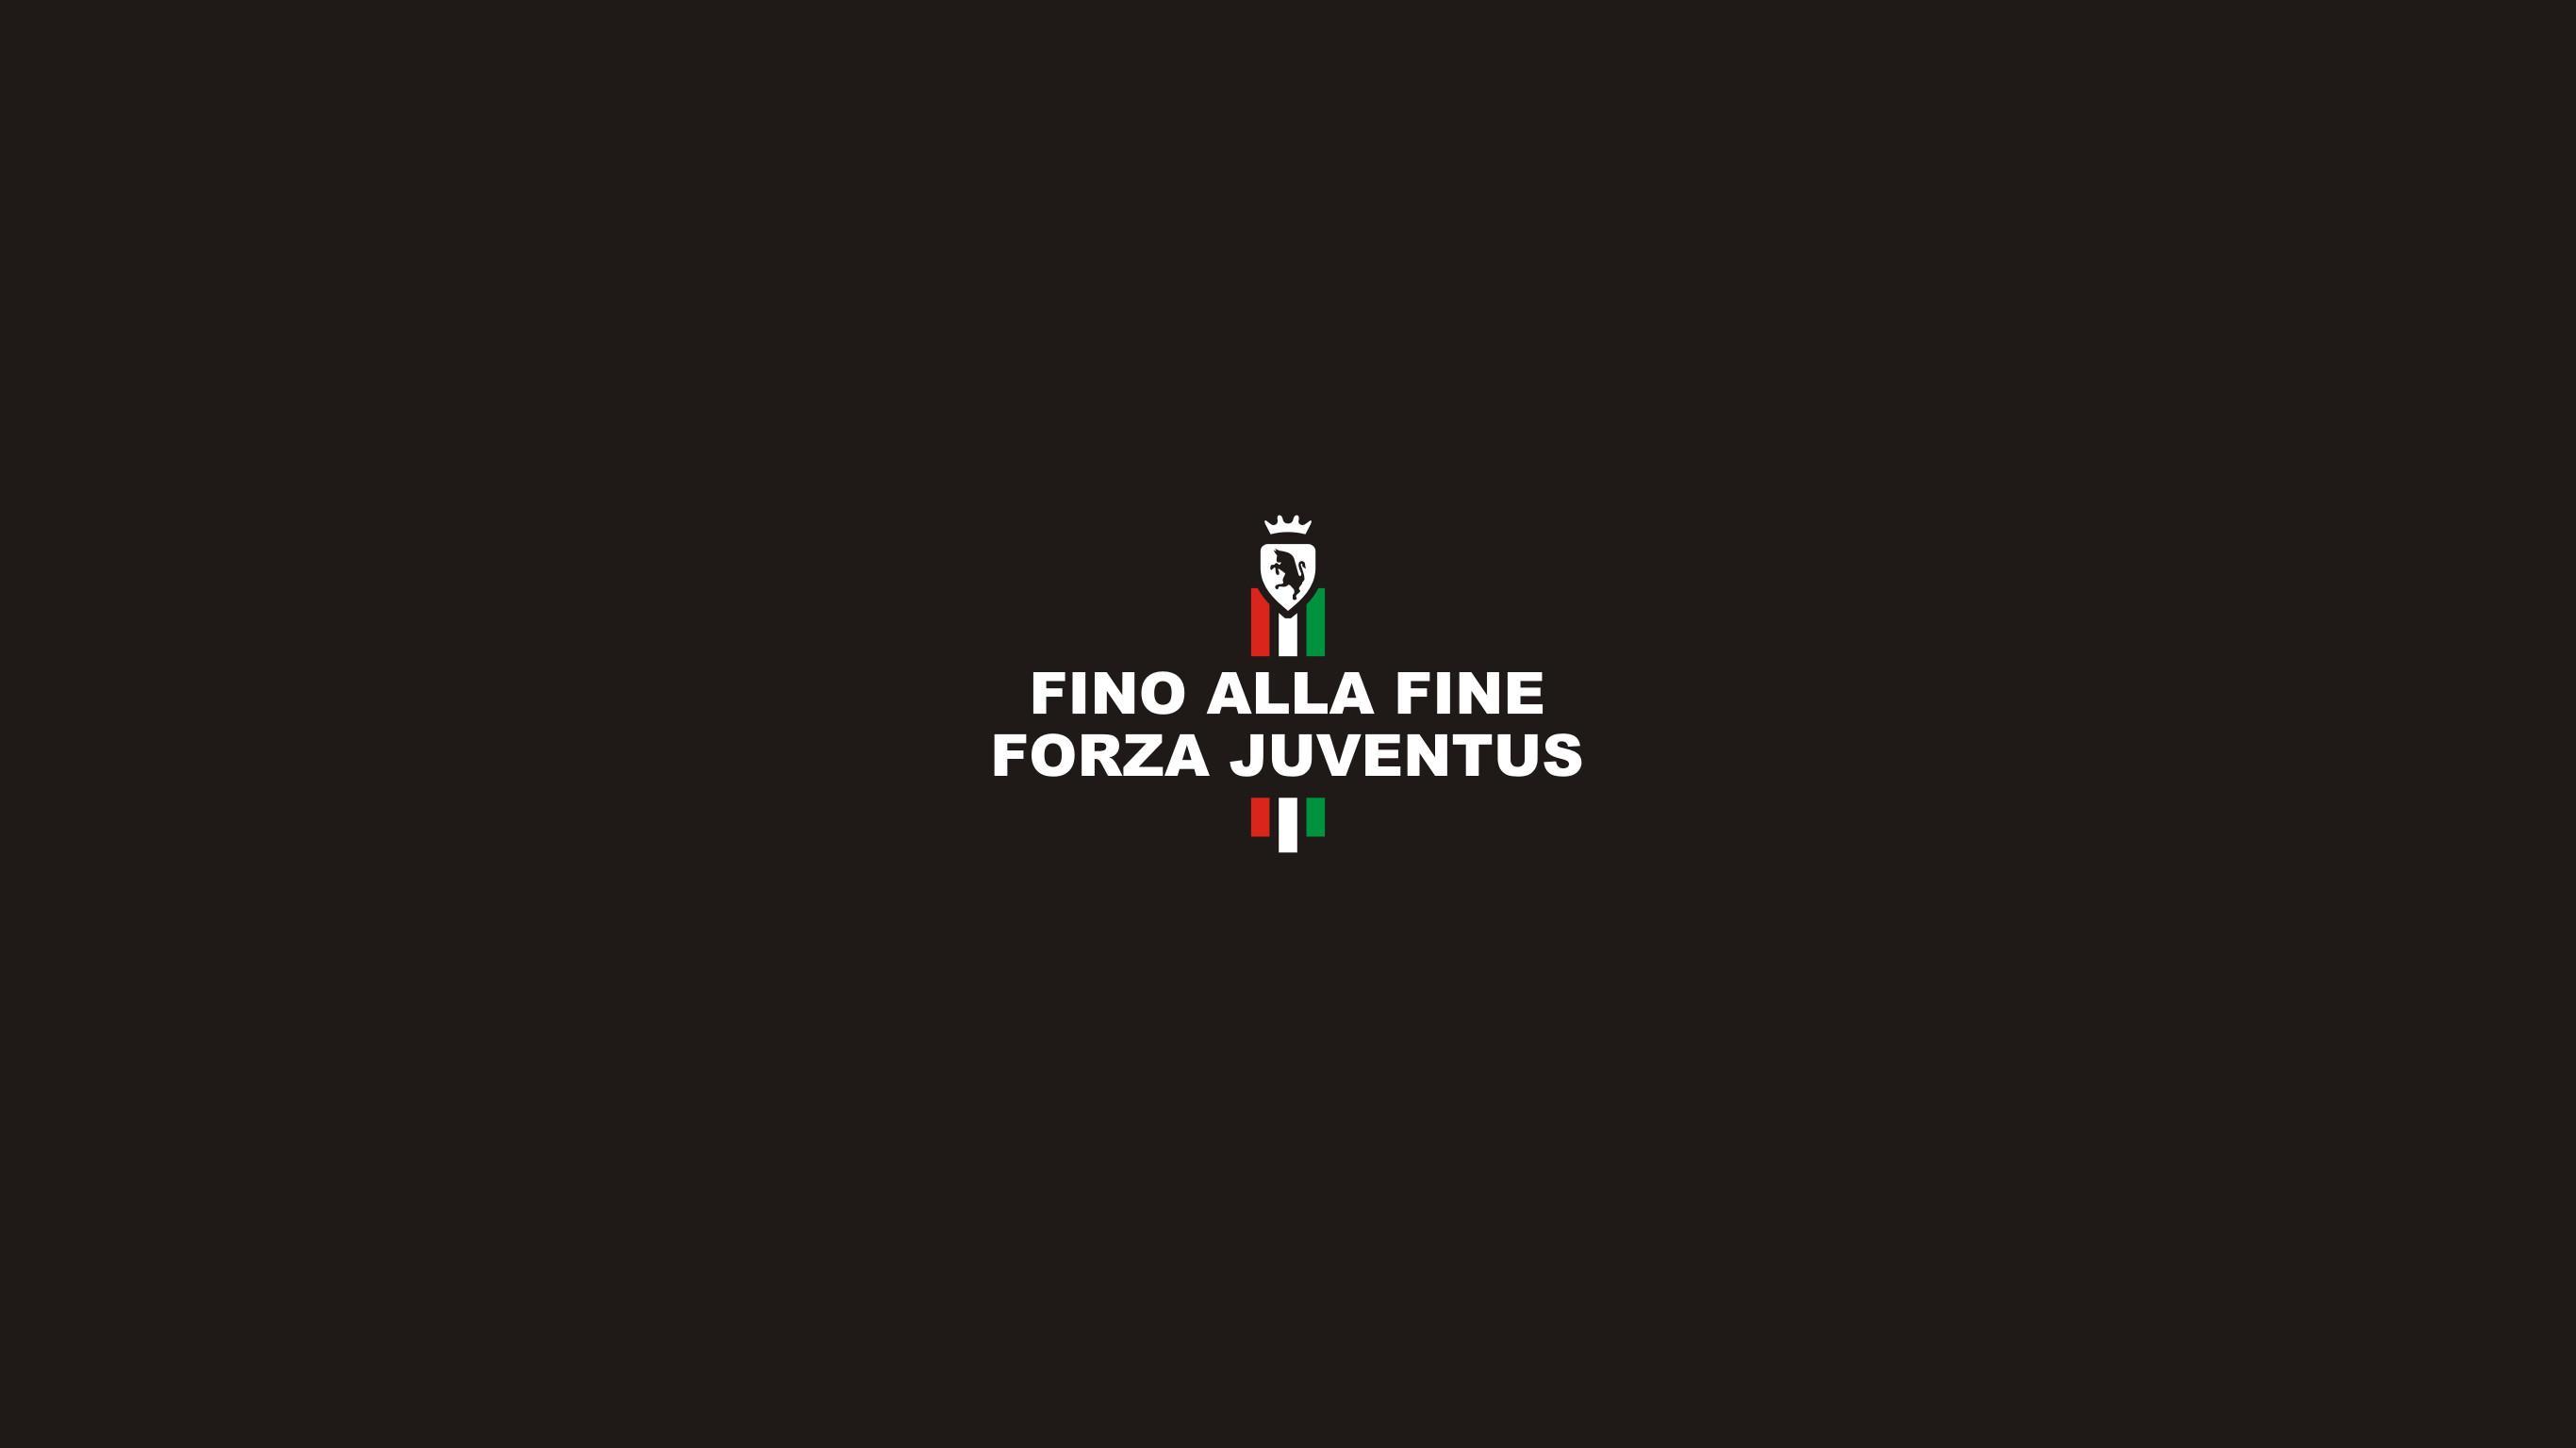 Juventus FC Wallpapers ·â' WallpaperTag